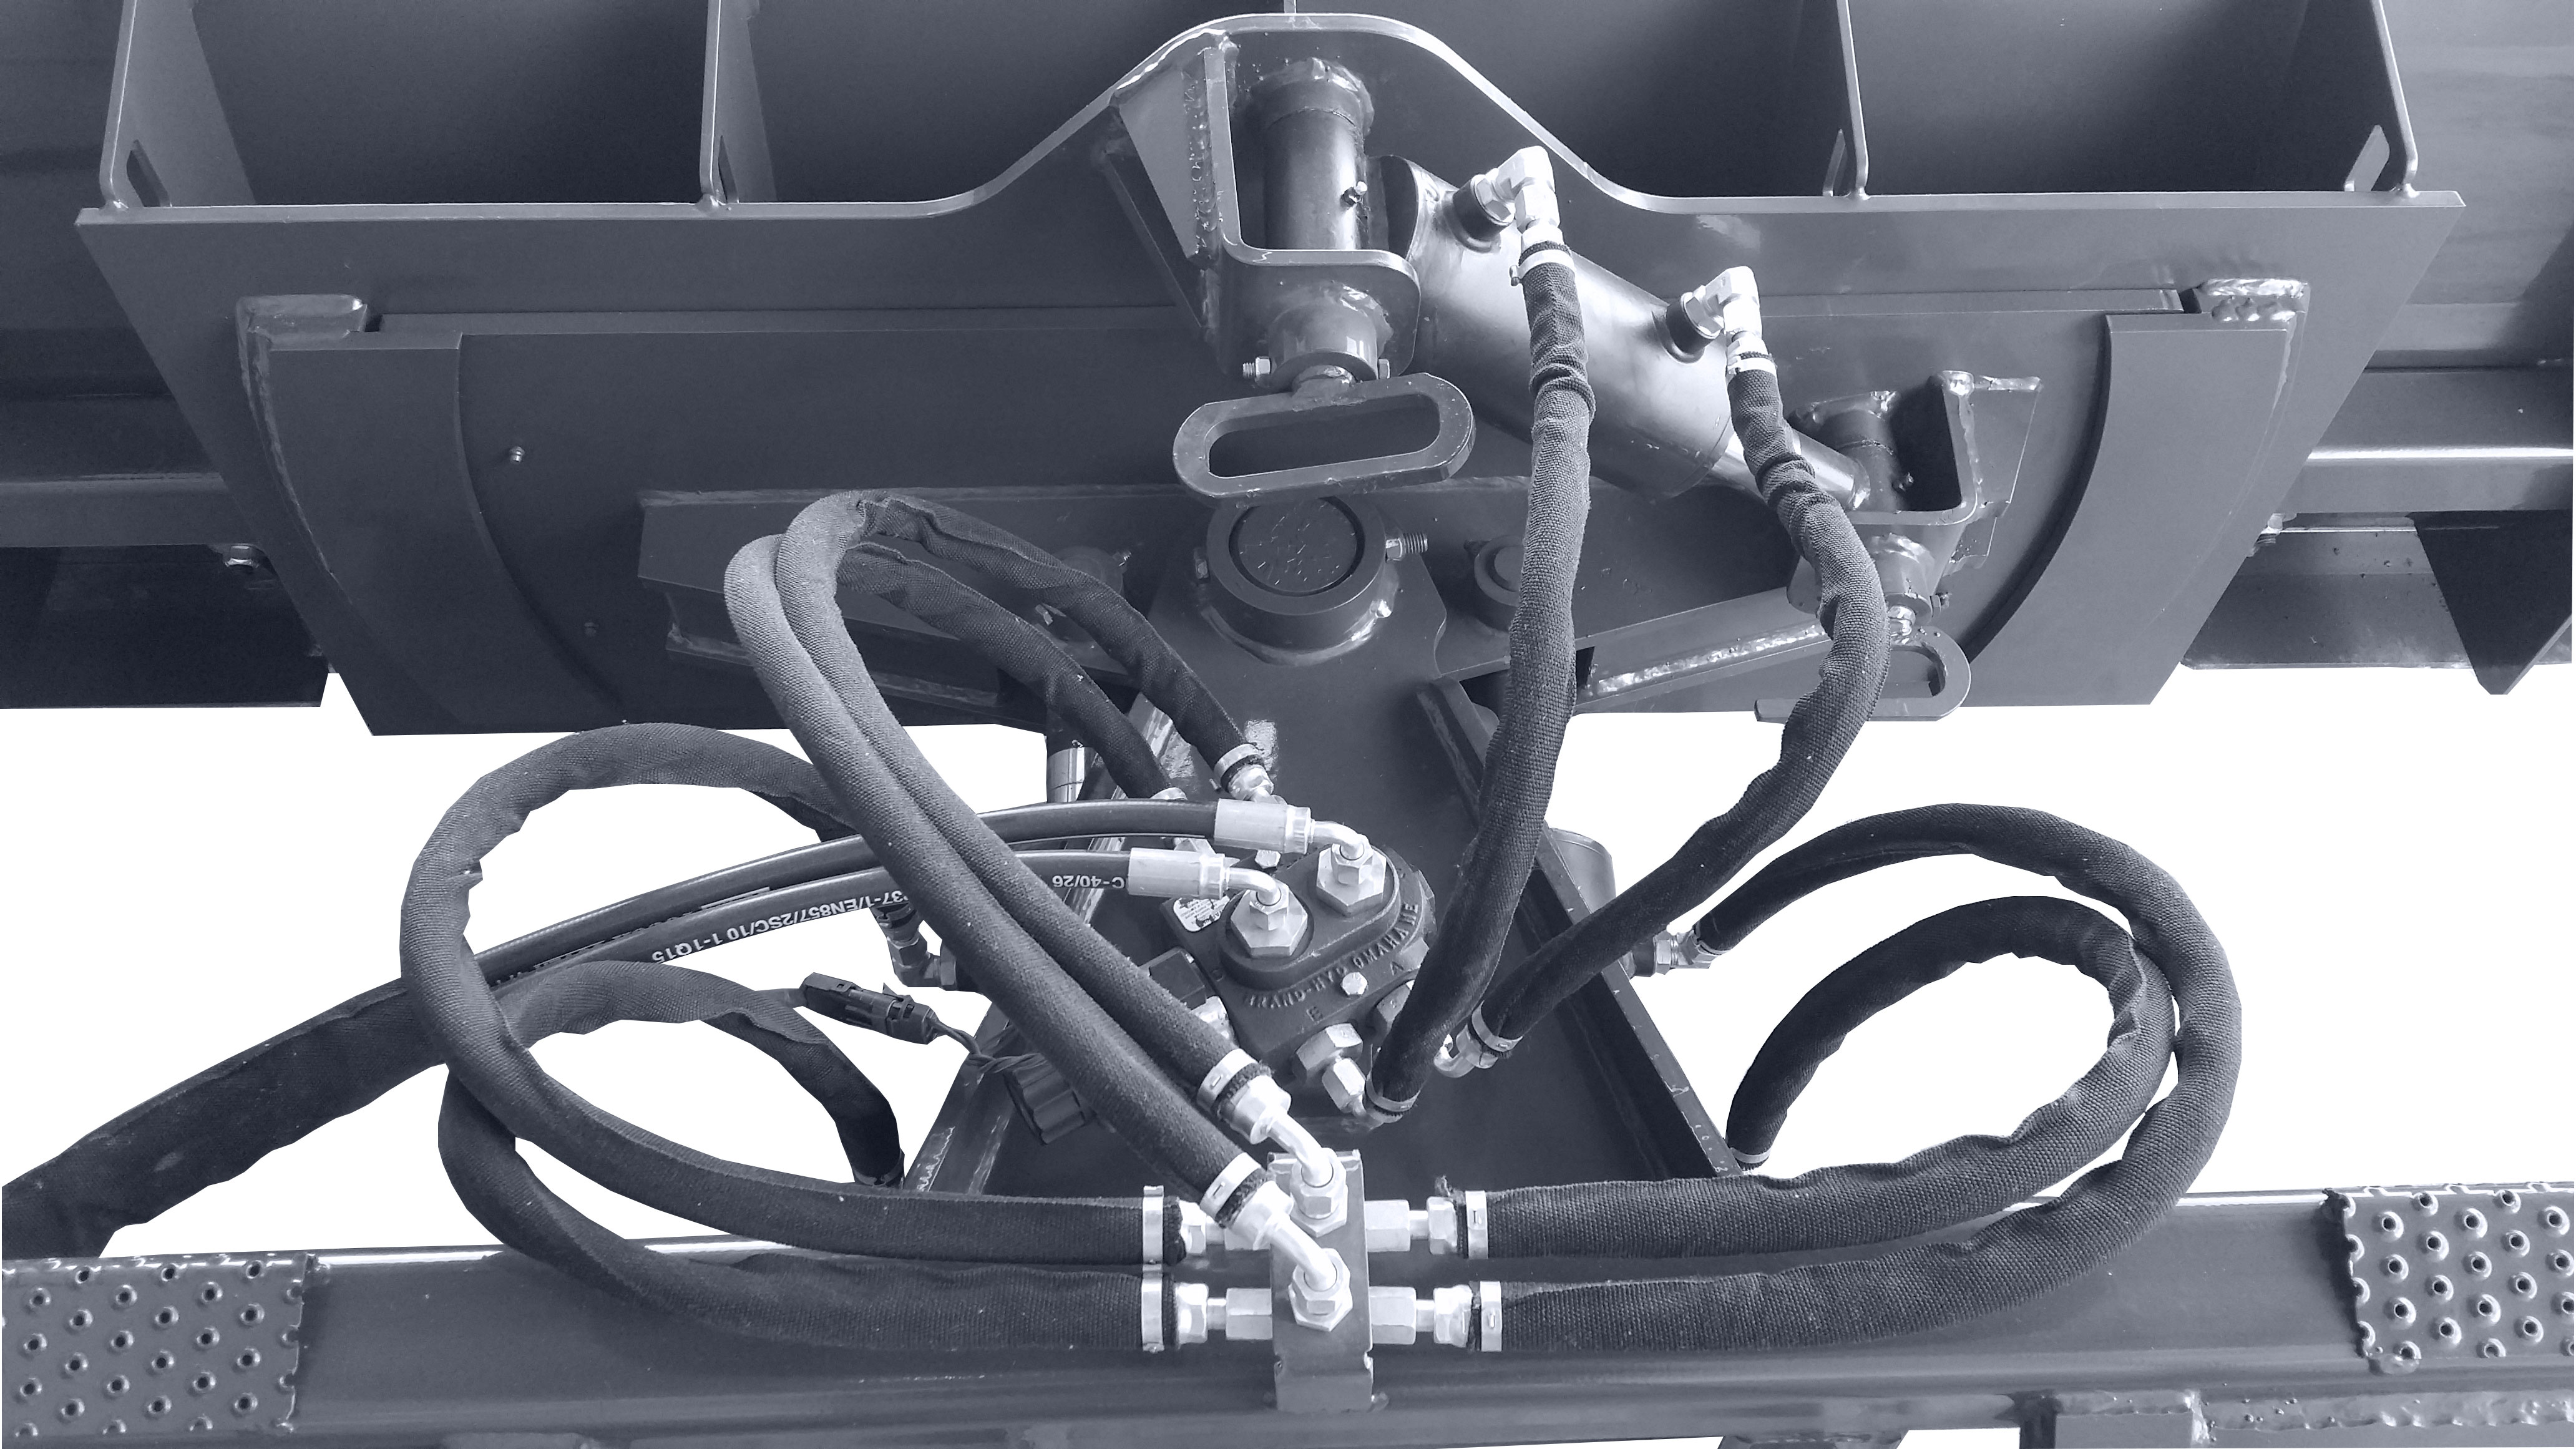 6-way-dozer-blade-back-view